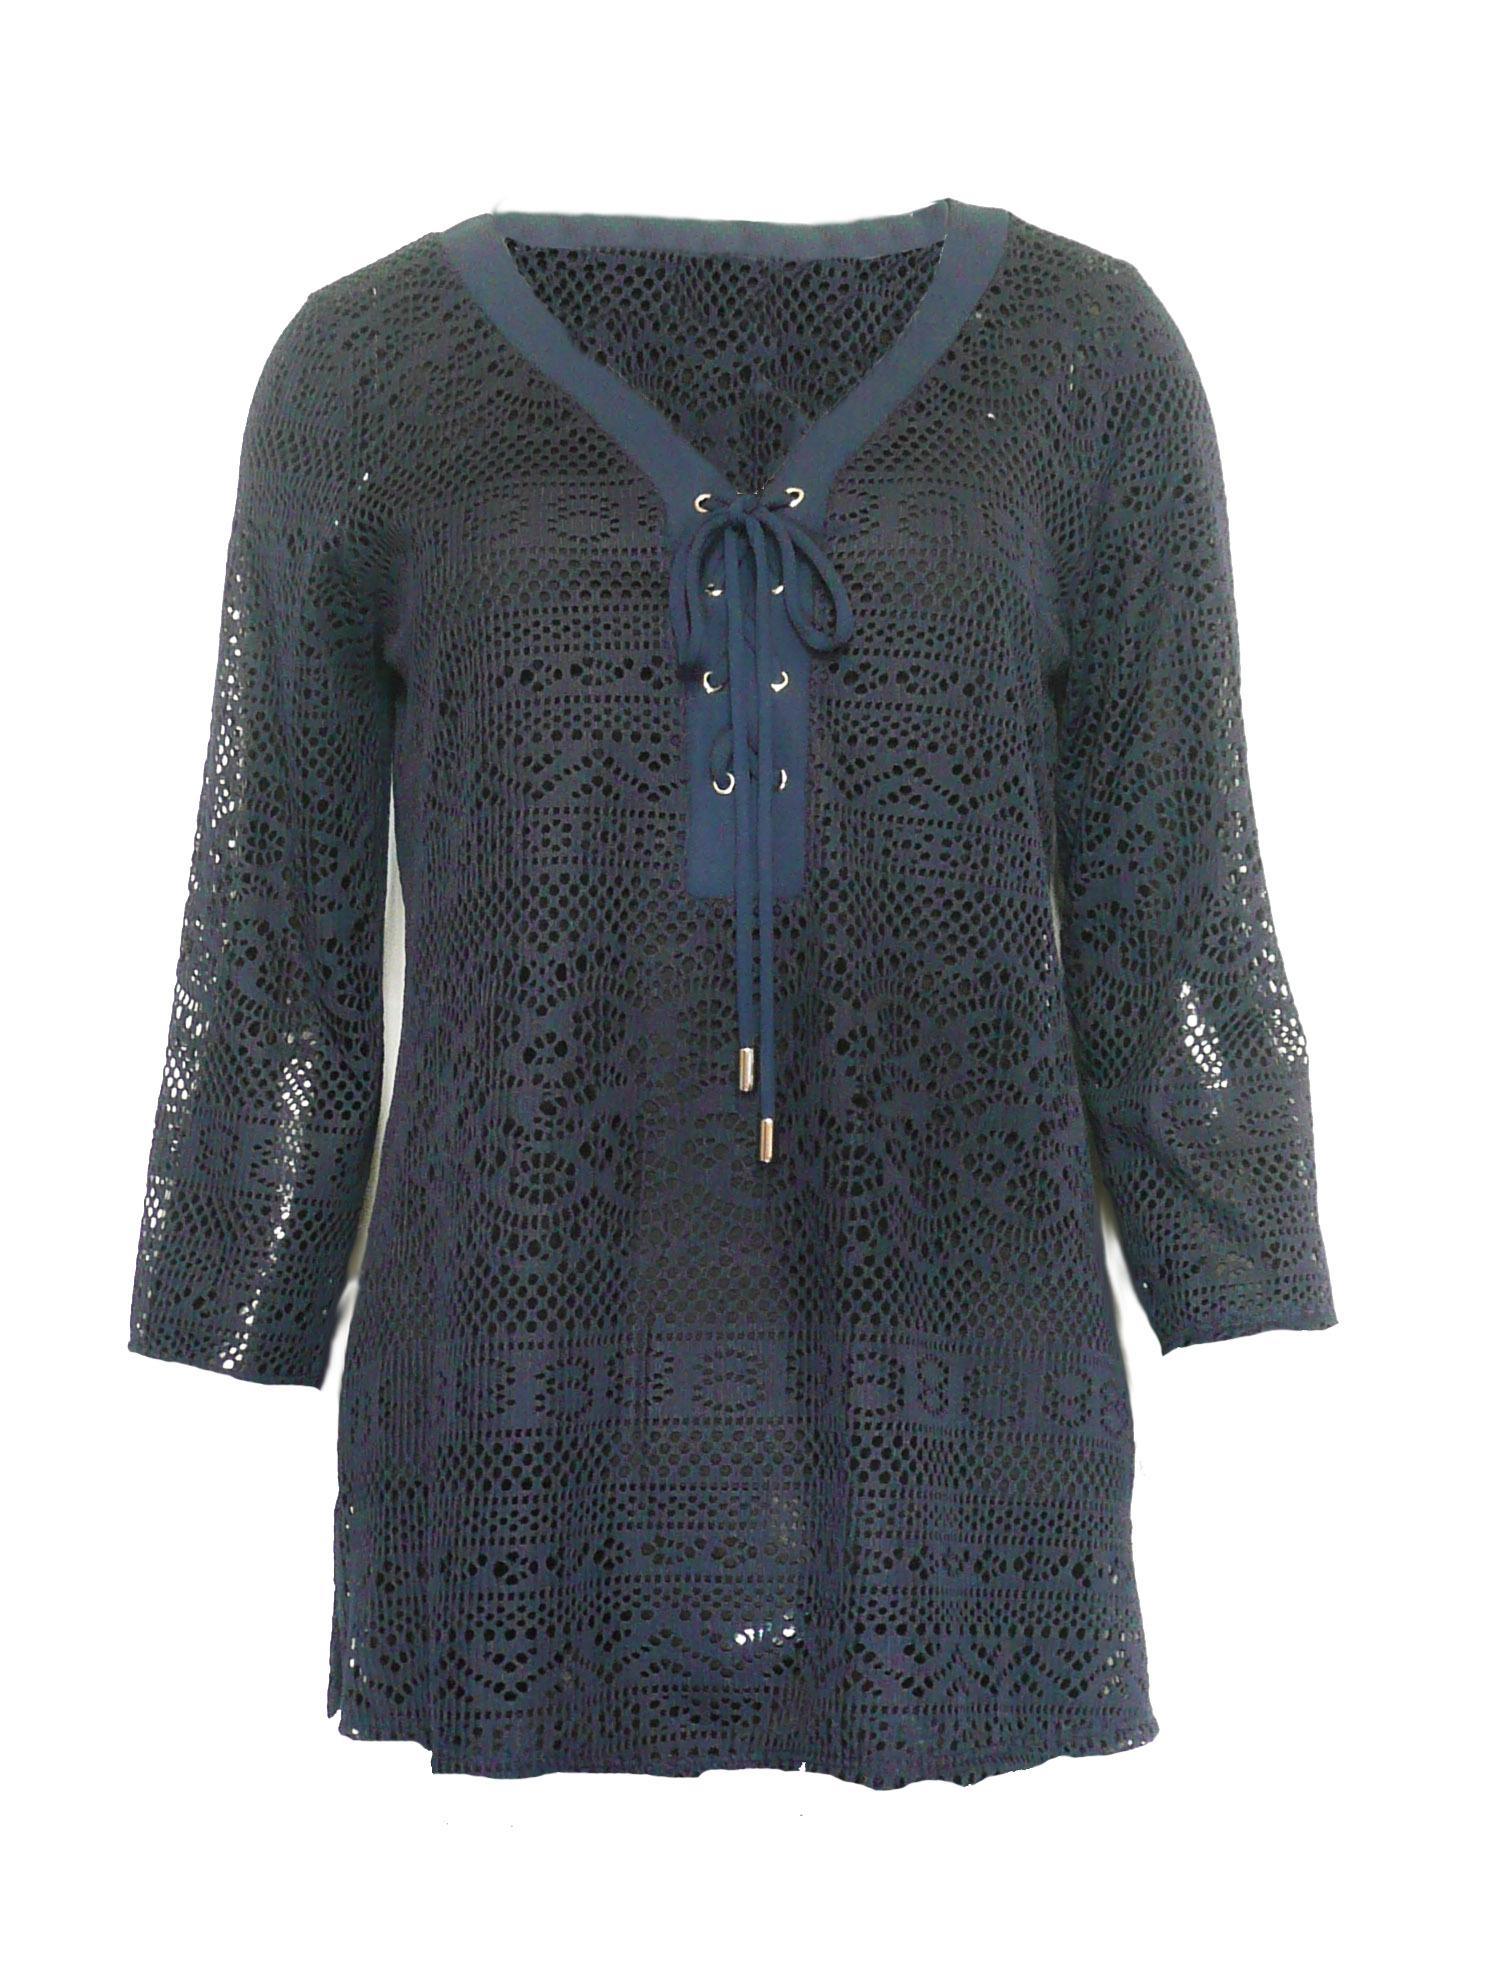 bls nvy lace tunic.jpg